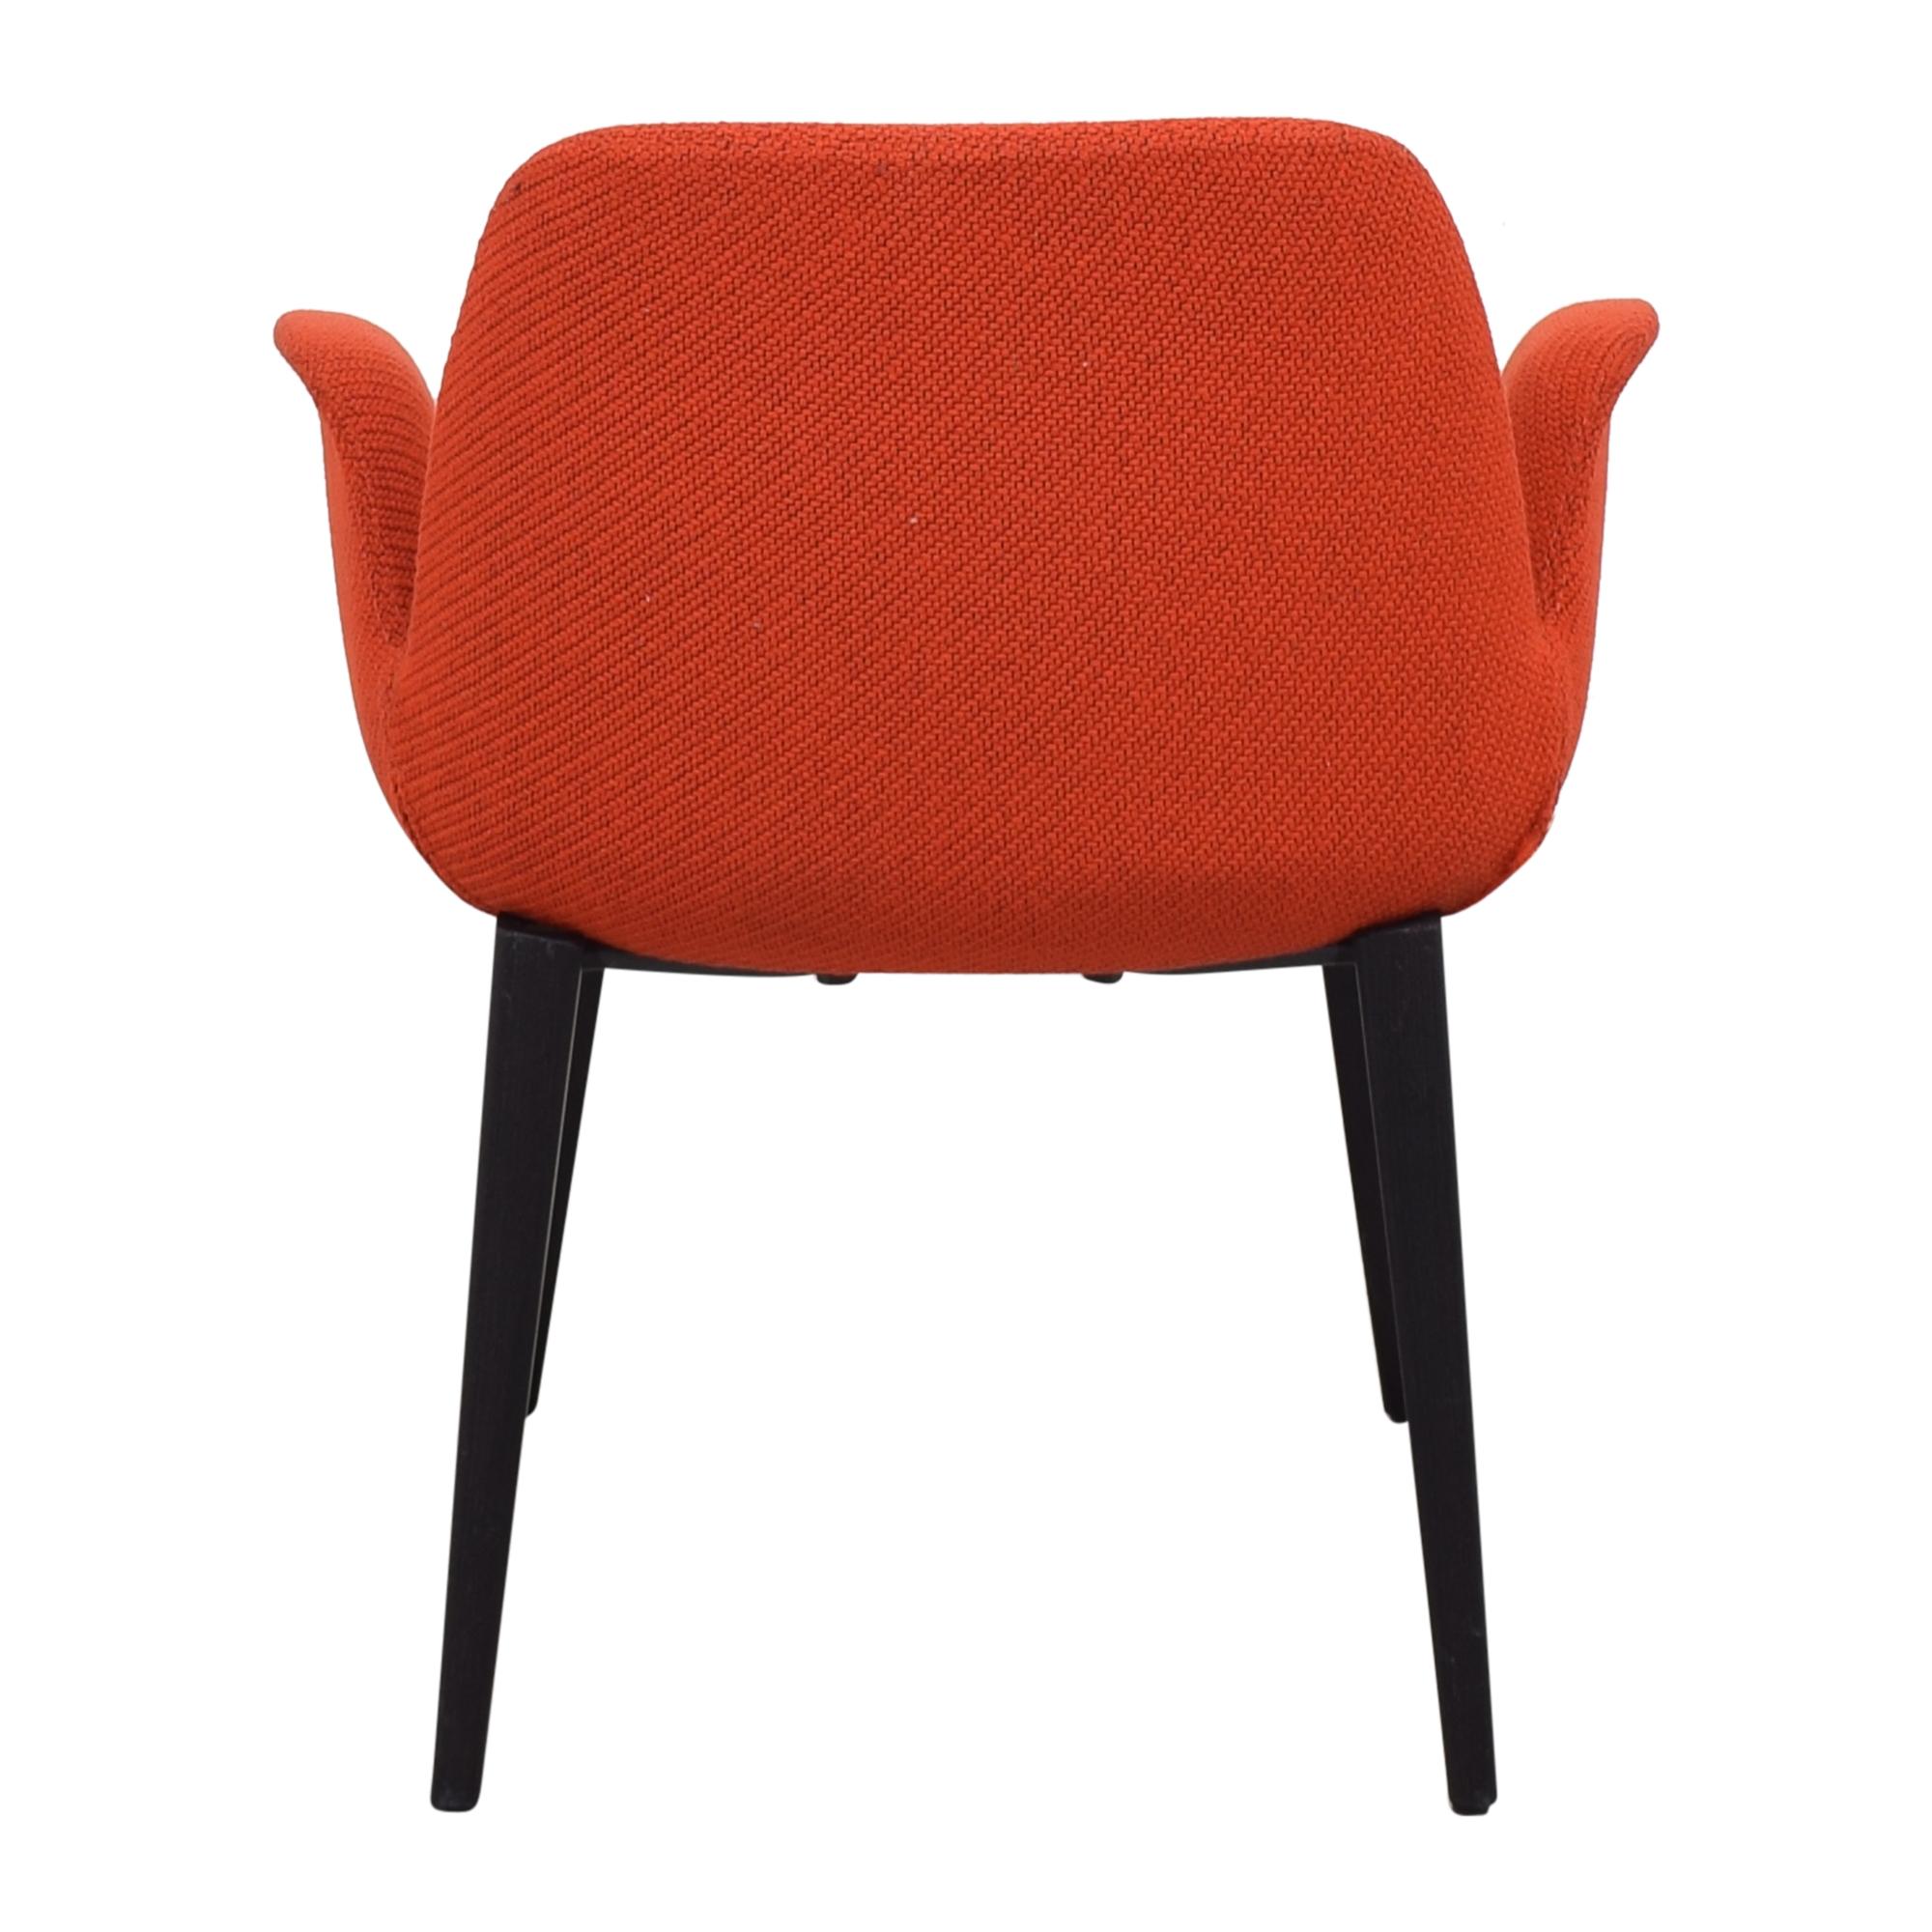 Koleksiyon Halia Arm Chair sale